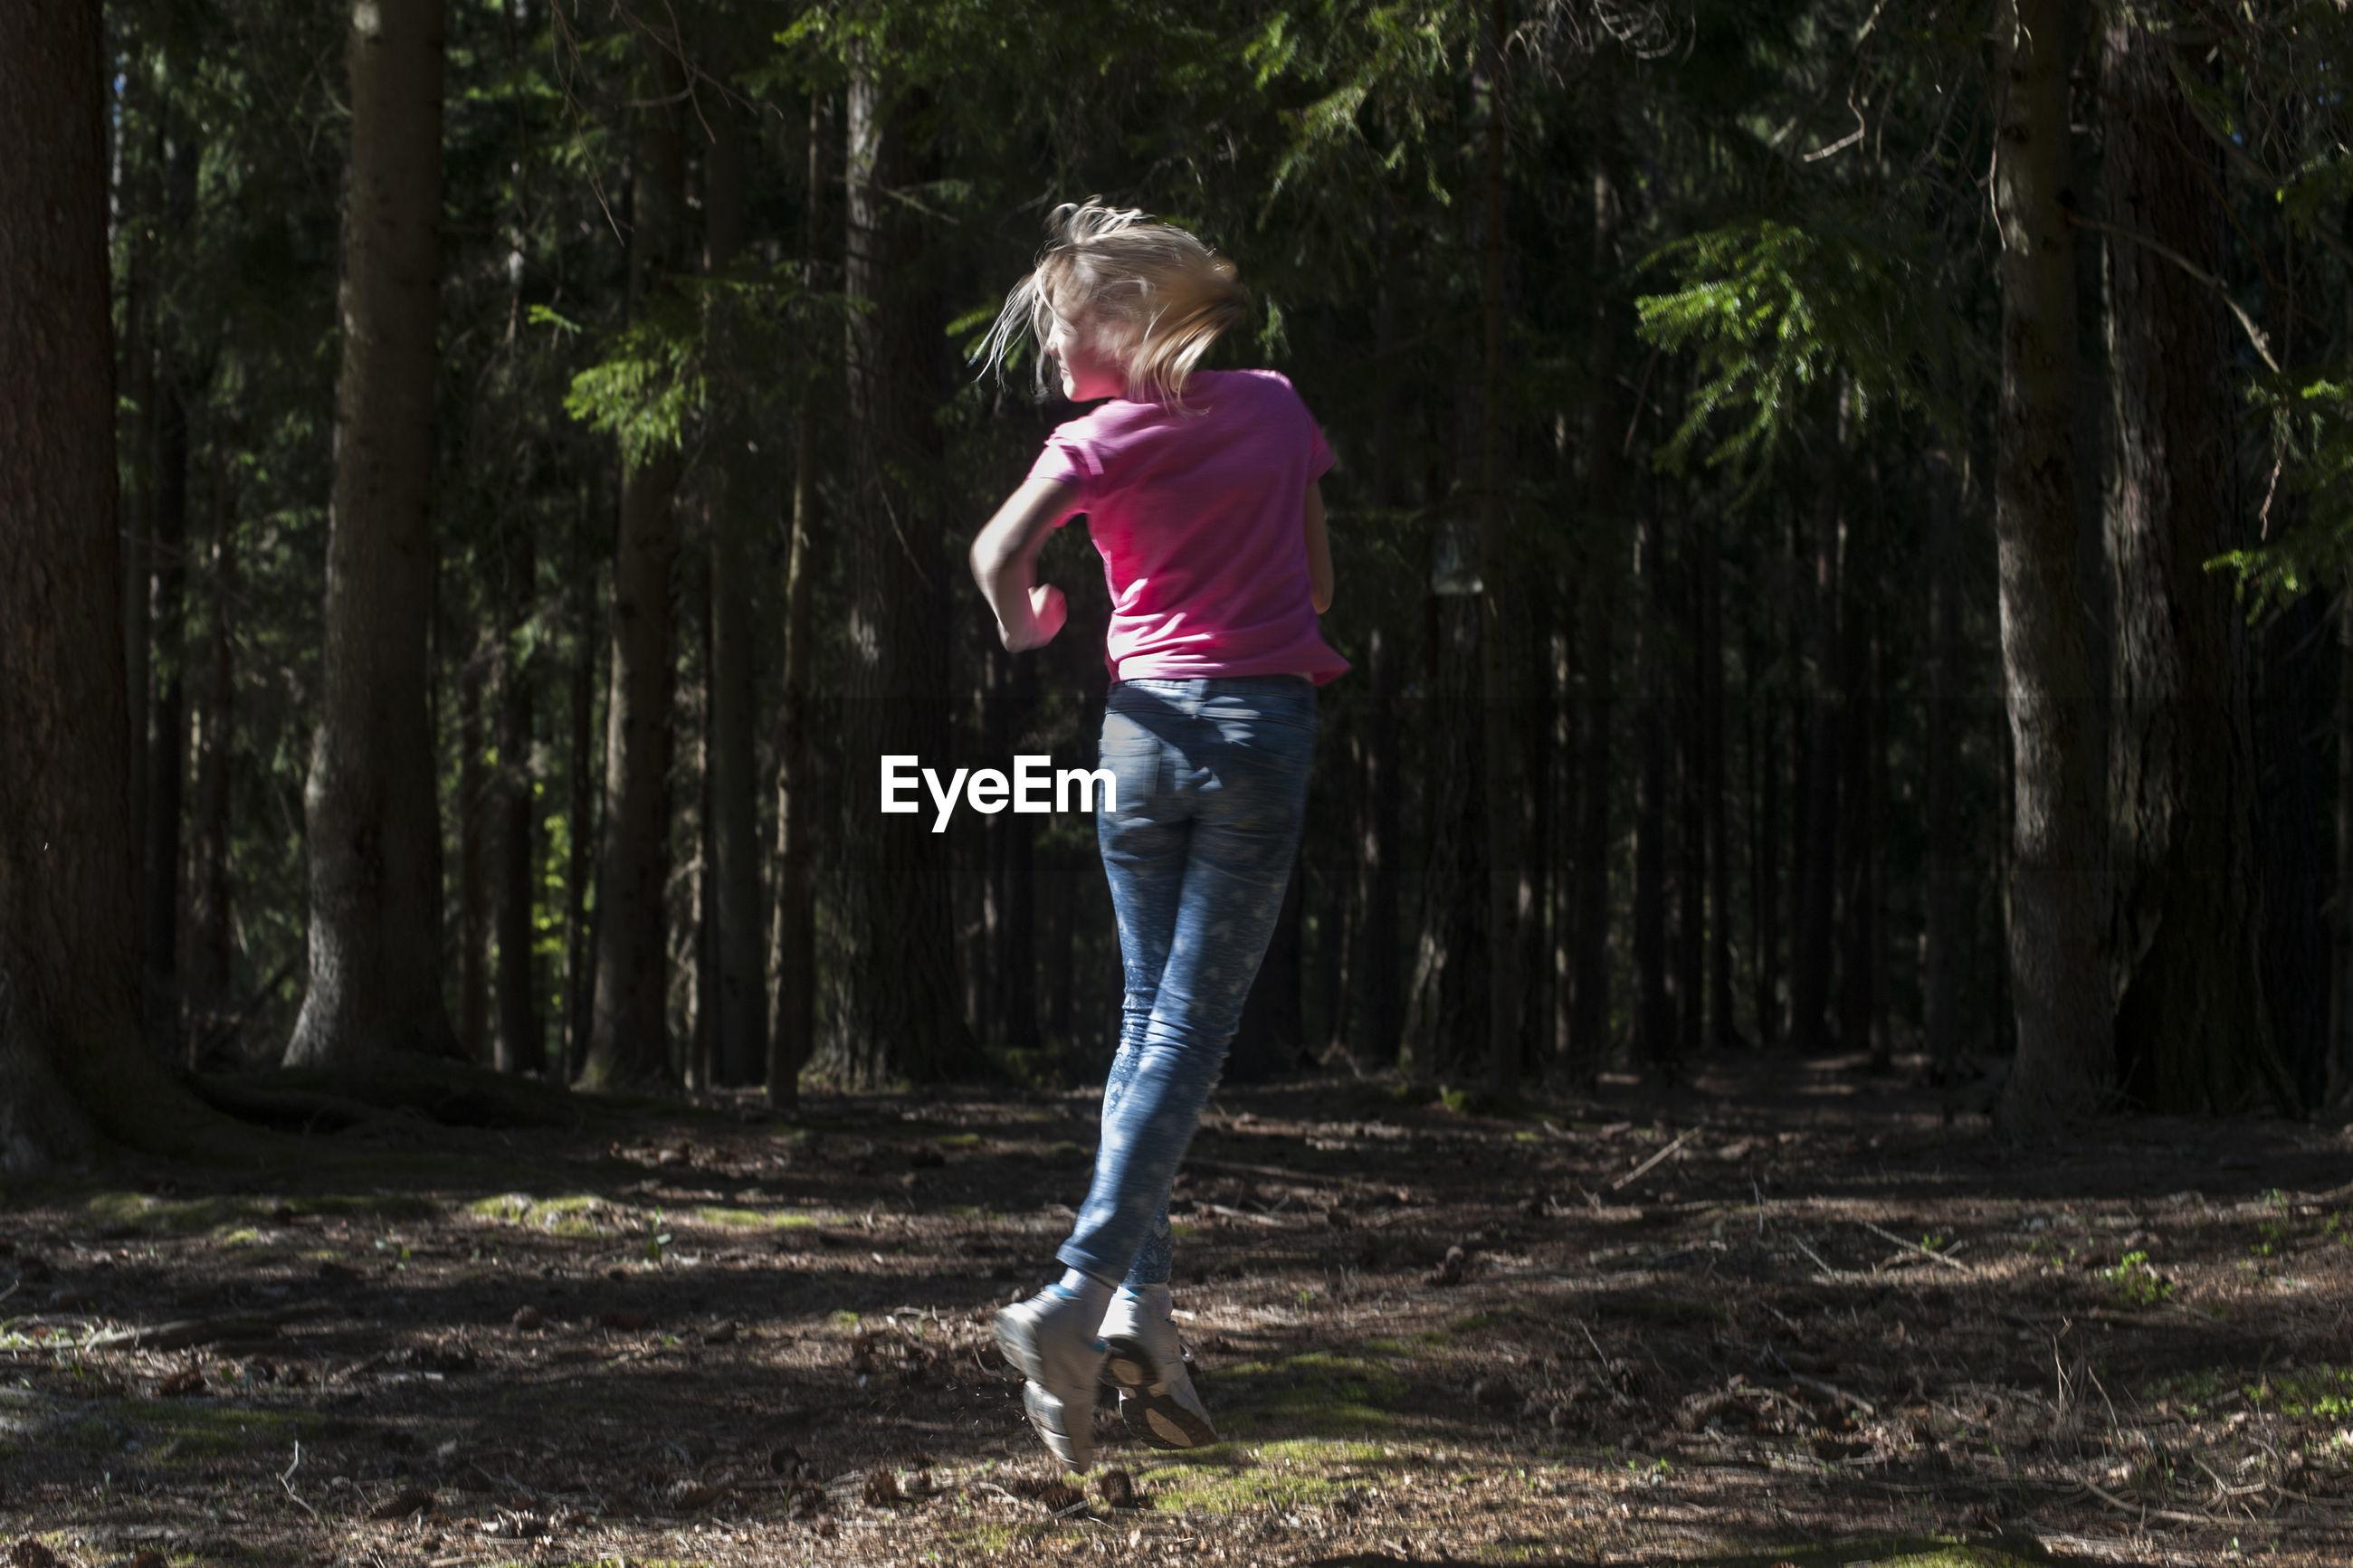 Full length of girl jumping in forest against trees